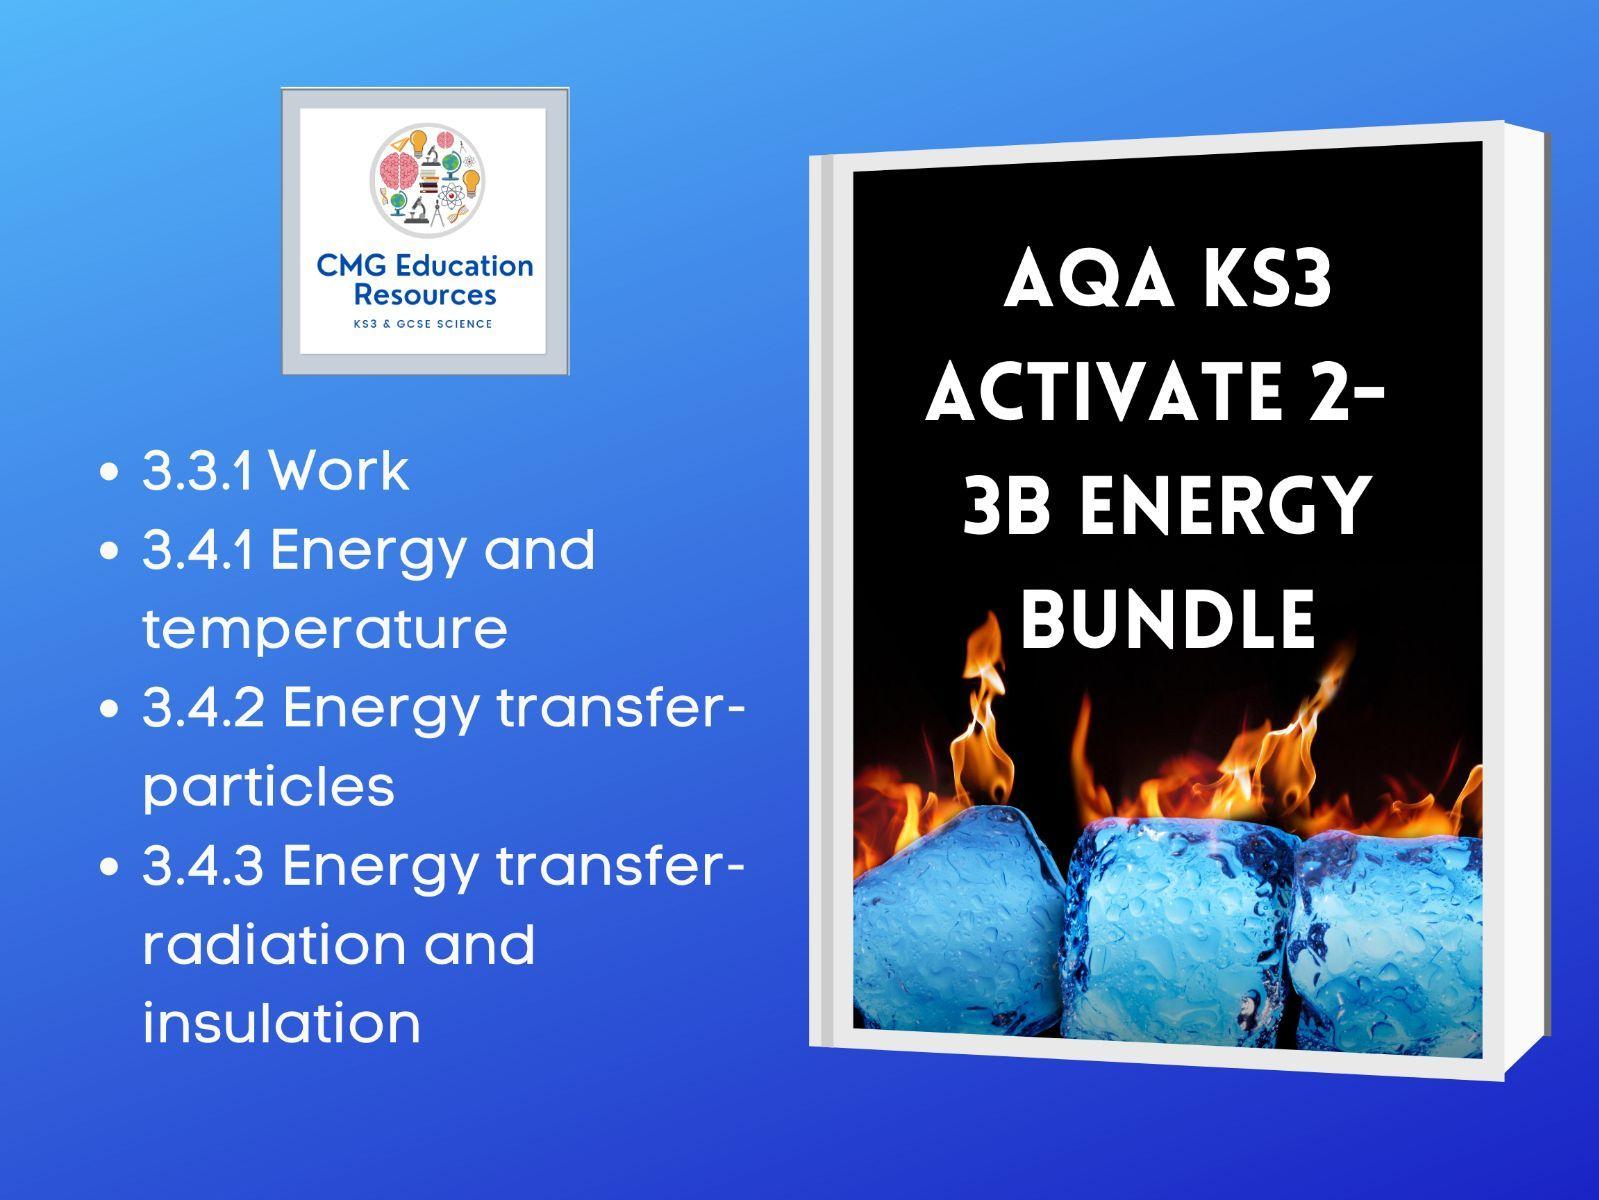 KS3 AQA Activate 2- 3b Energy bundle